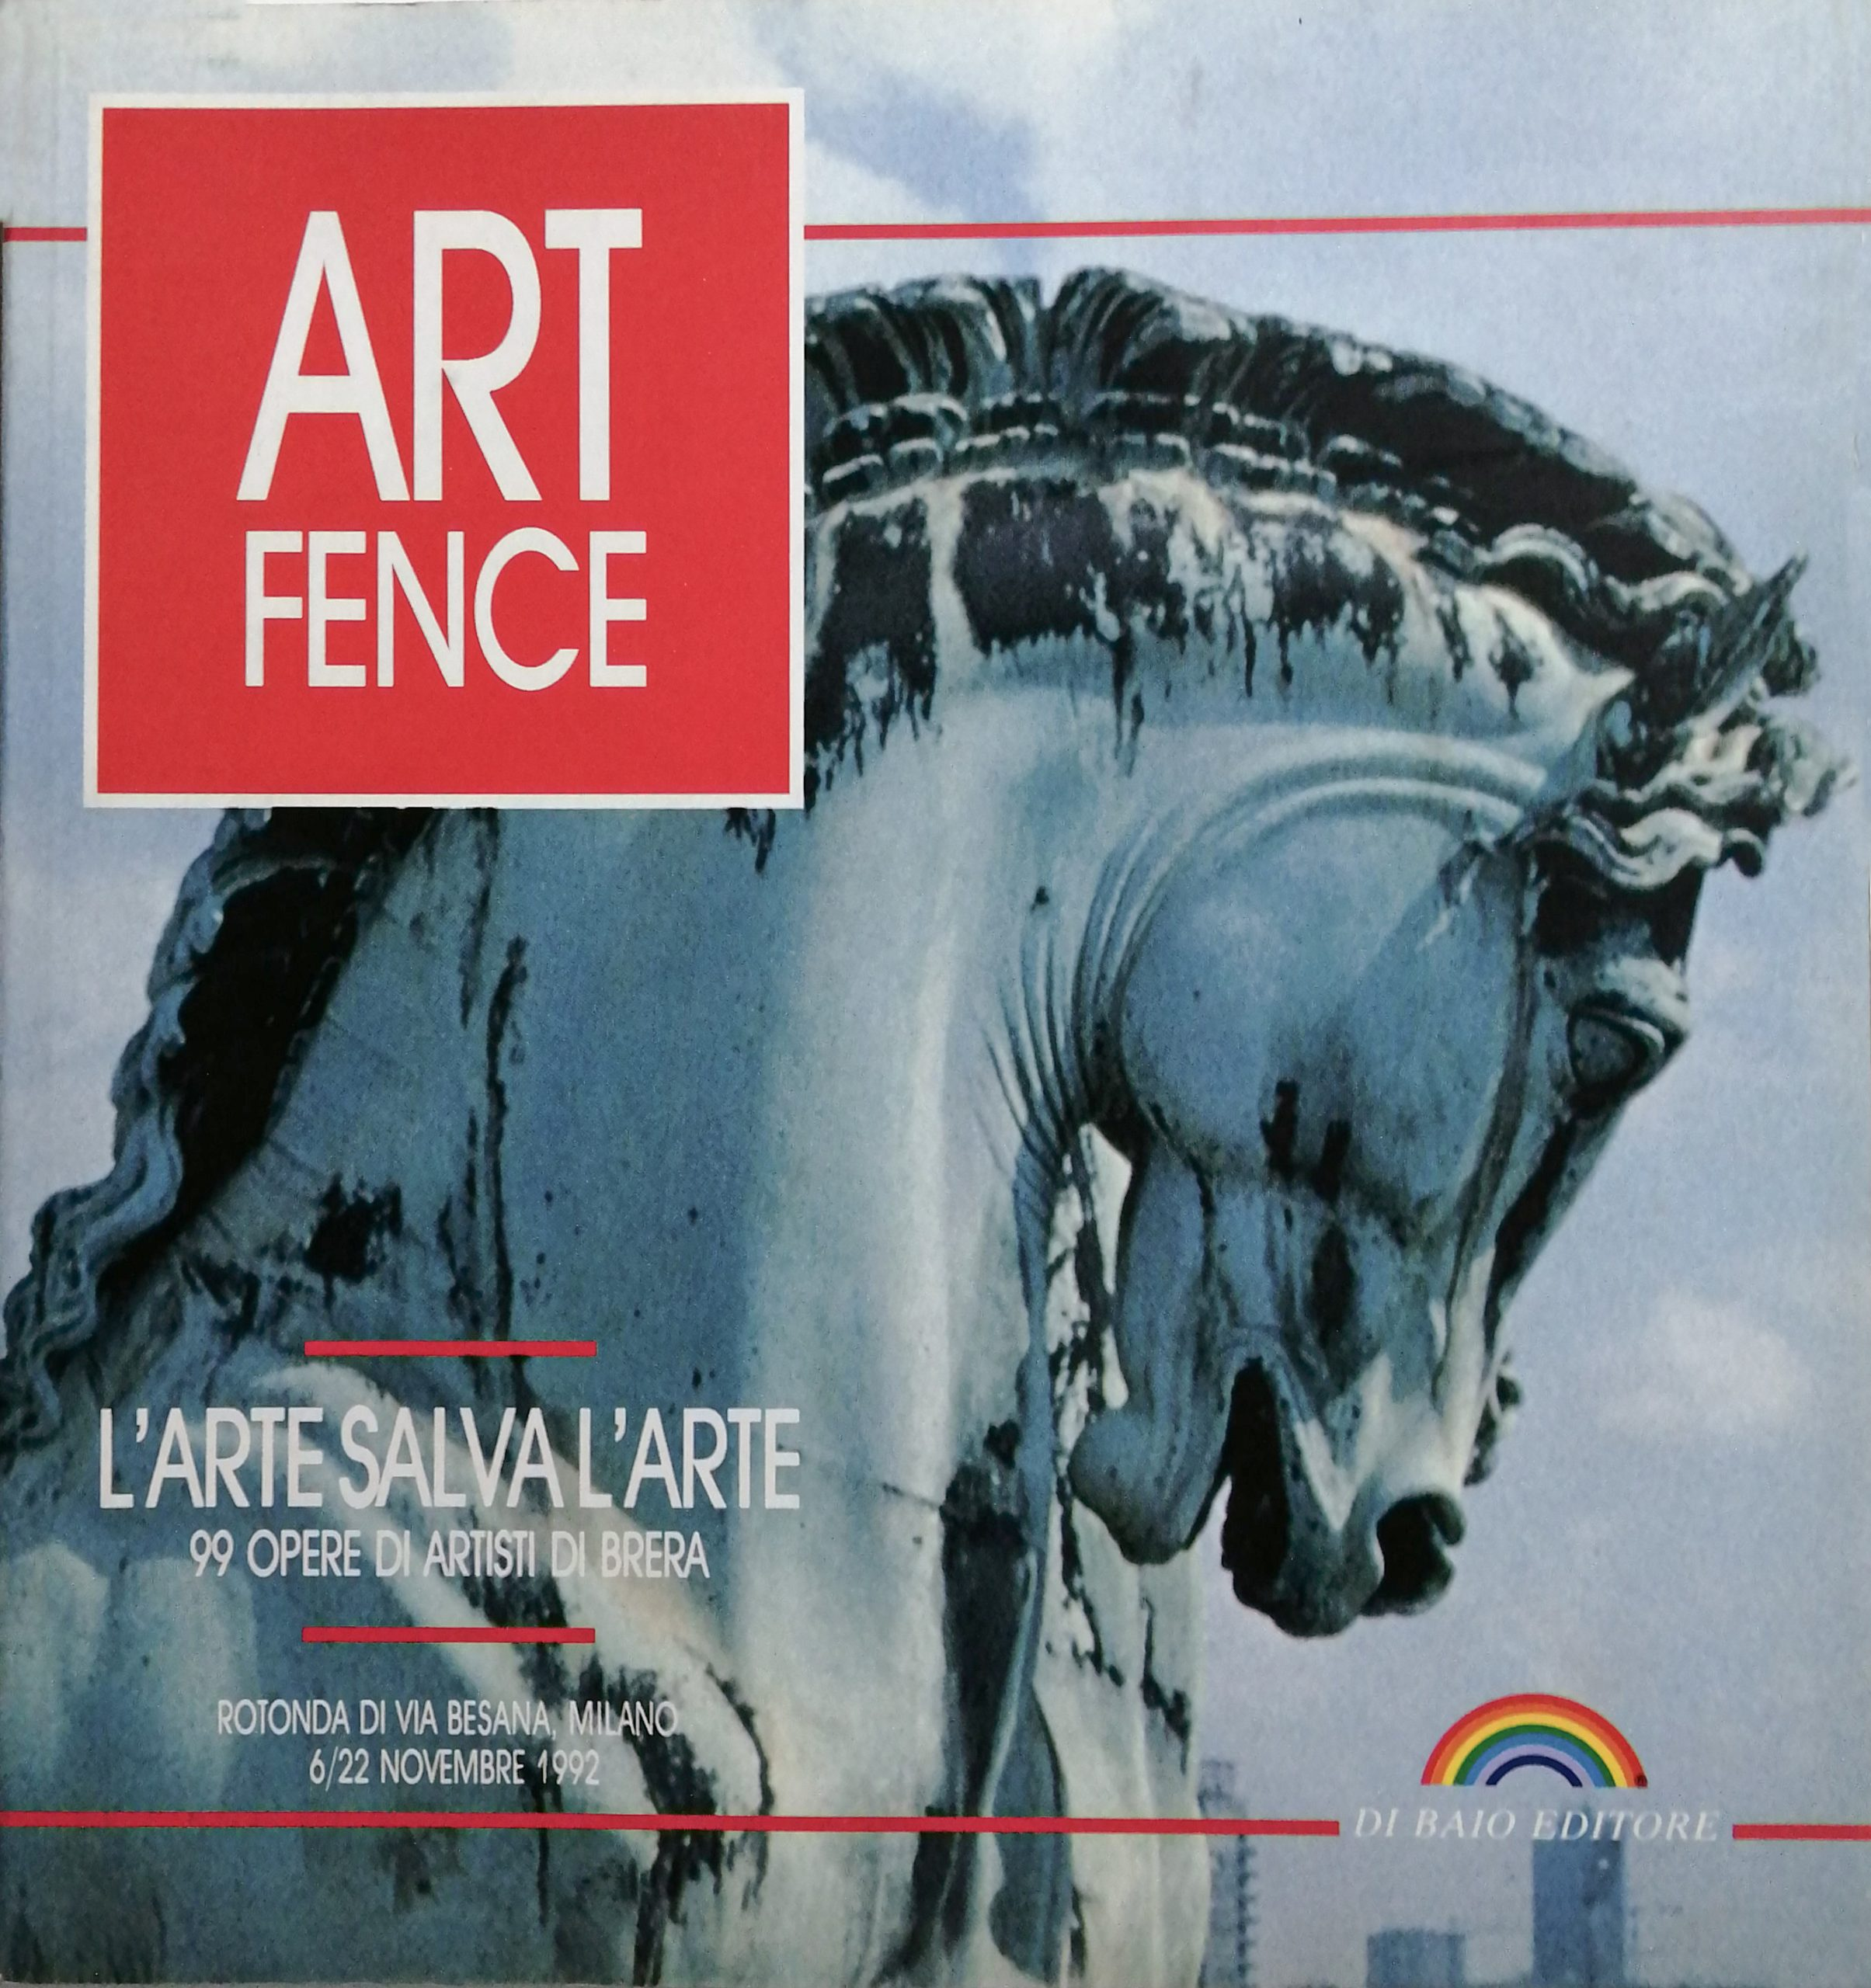 1992 Art Fence Rotonda della Besana Milano scaled - Bibliography/ Catalogues